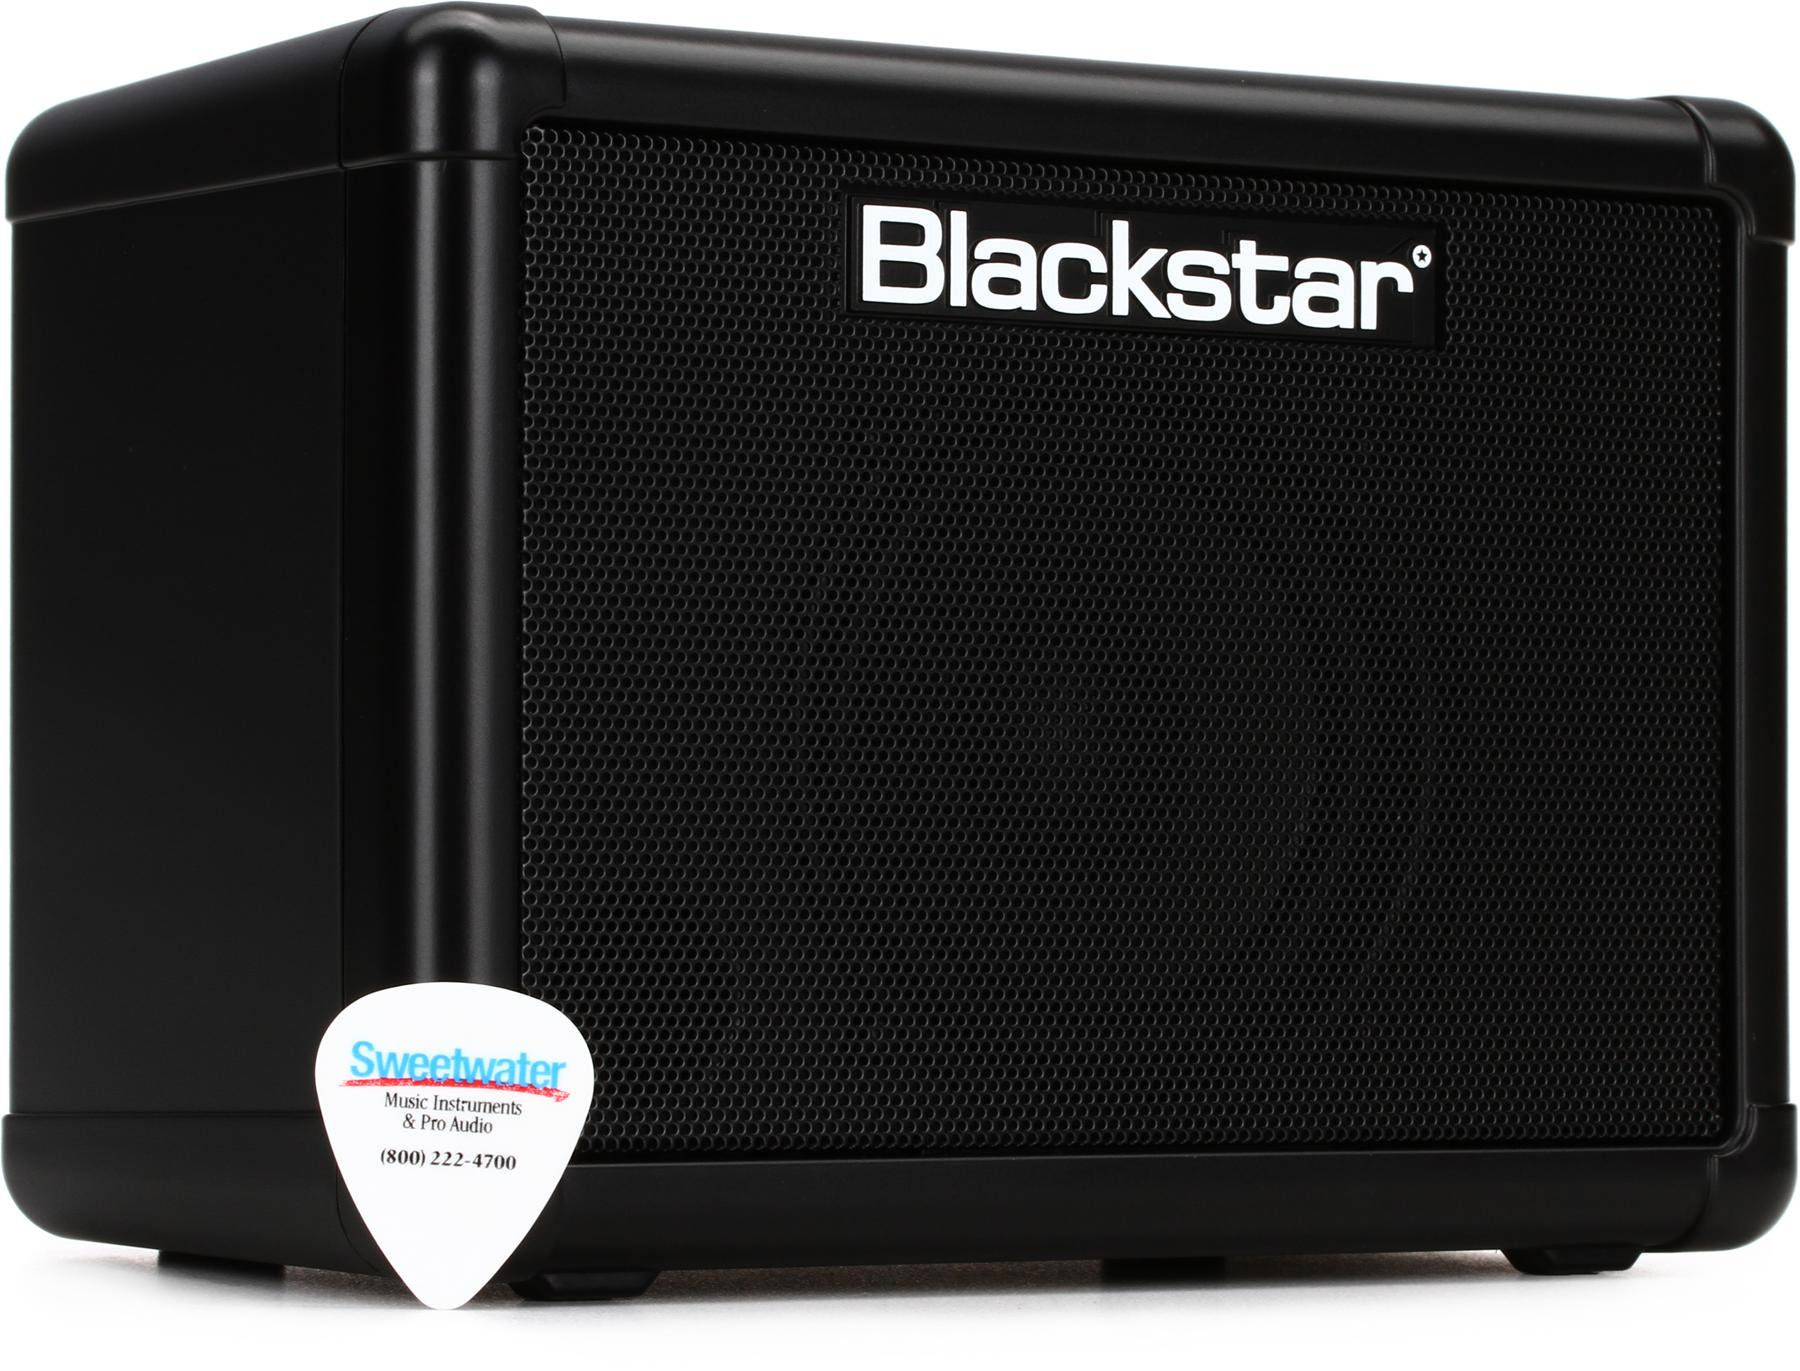 1. Blackstar Electric Guitar Mini Amplifier, Black (FLY3)